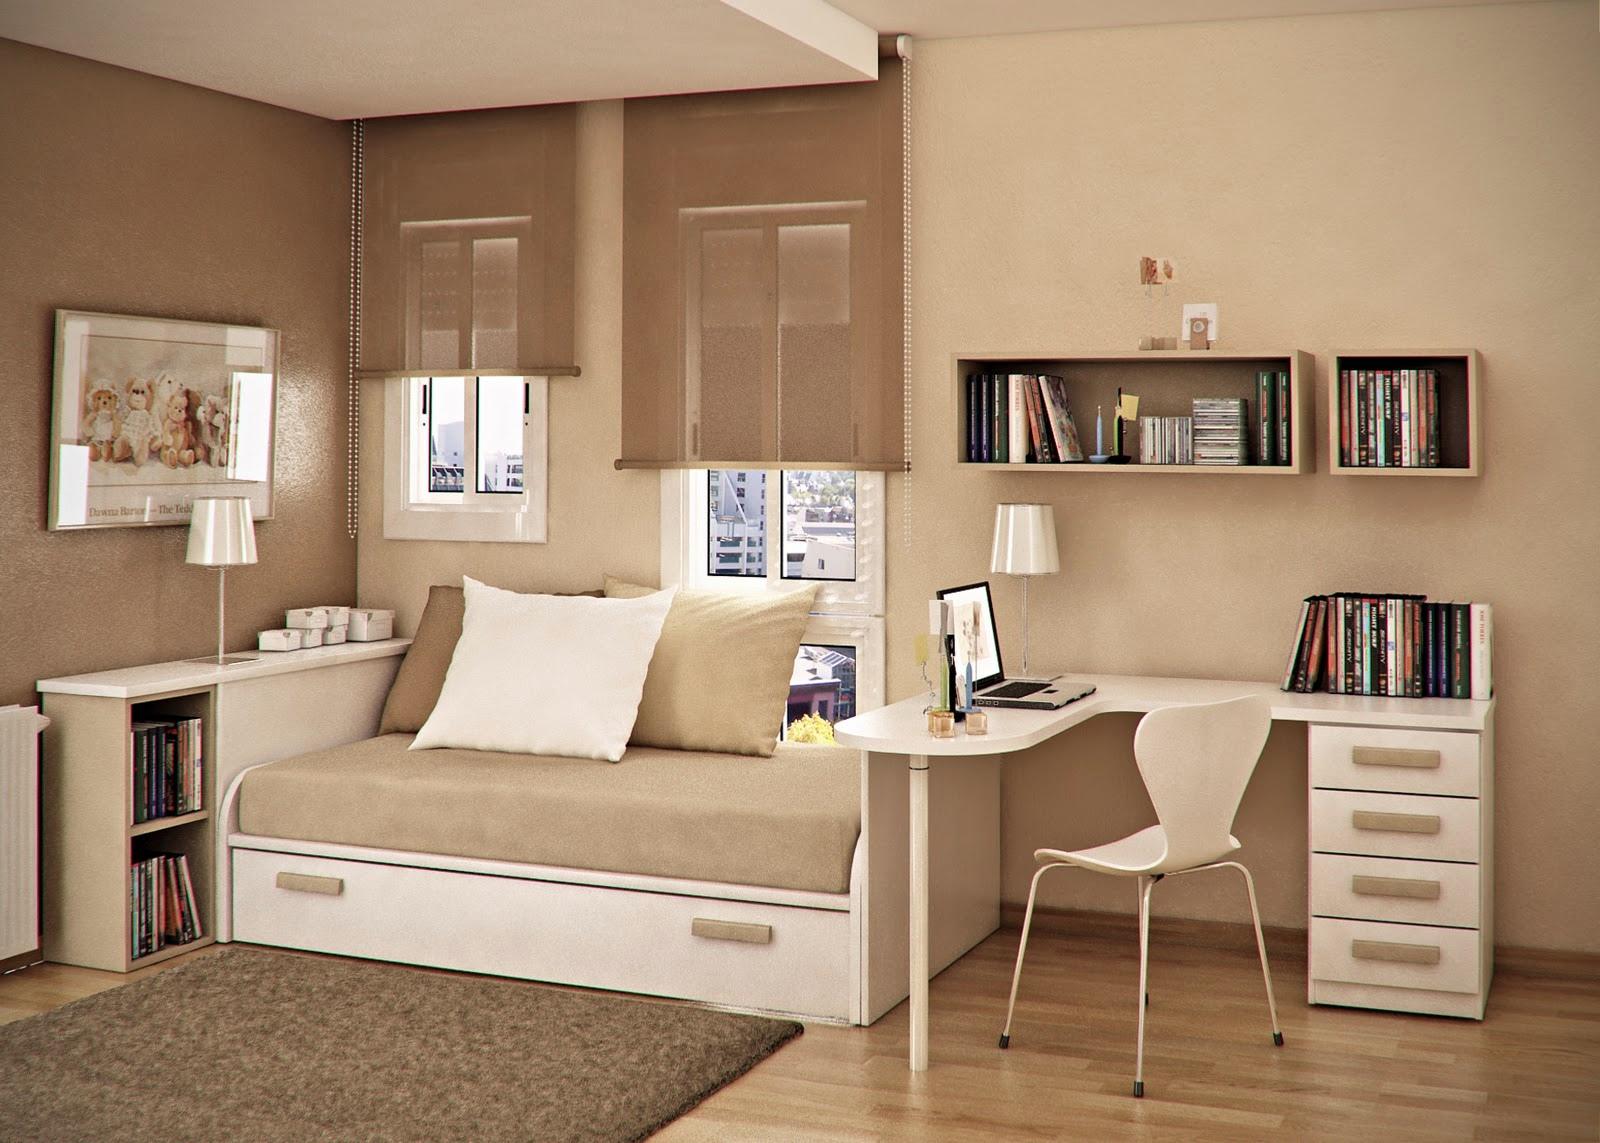 Gorgeous%2BSpace%2BSaving%2BIdeas%2Bfor%2BSmall%2BTeenage%2BDesks%2BBedroom%2BDecoration%2B%252810%2529 Gorgeous Space Saving Ideas for Small Teenage Desks Bedroom Decoration Interior